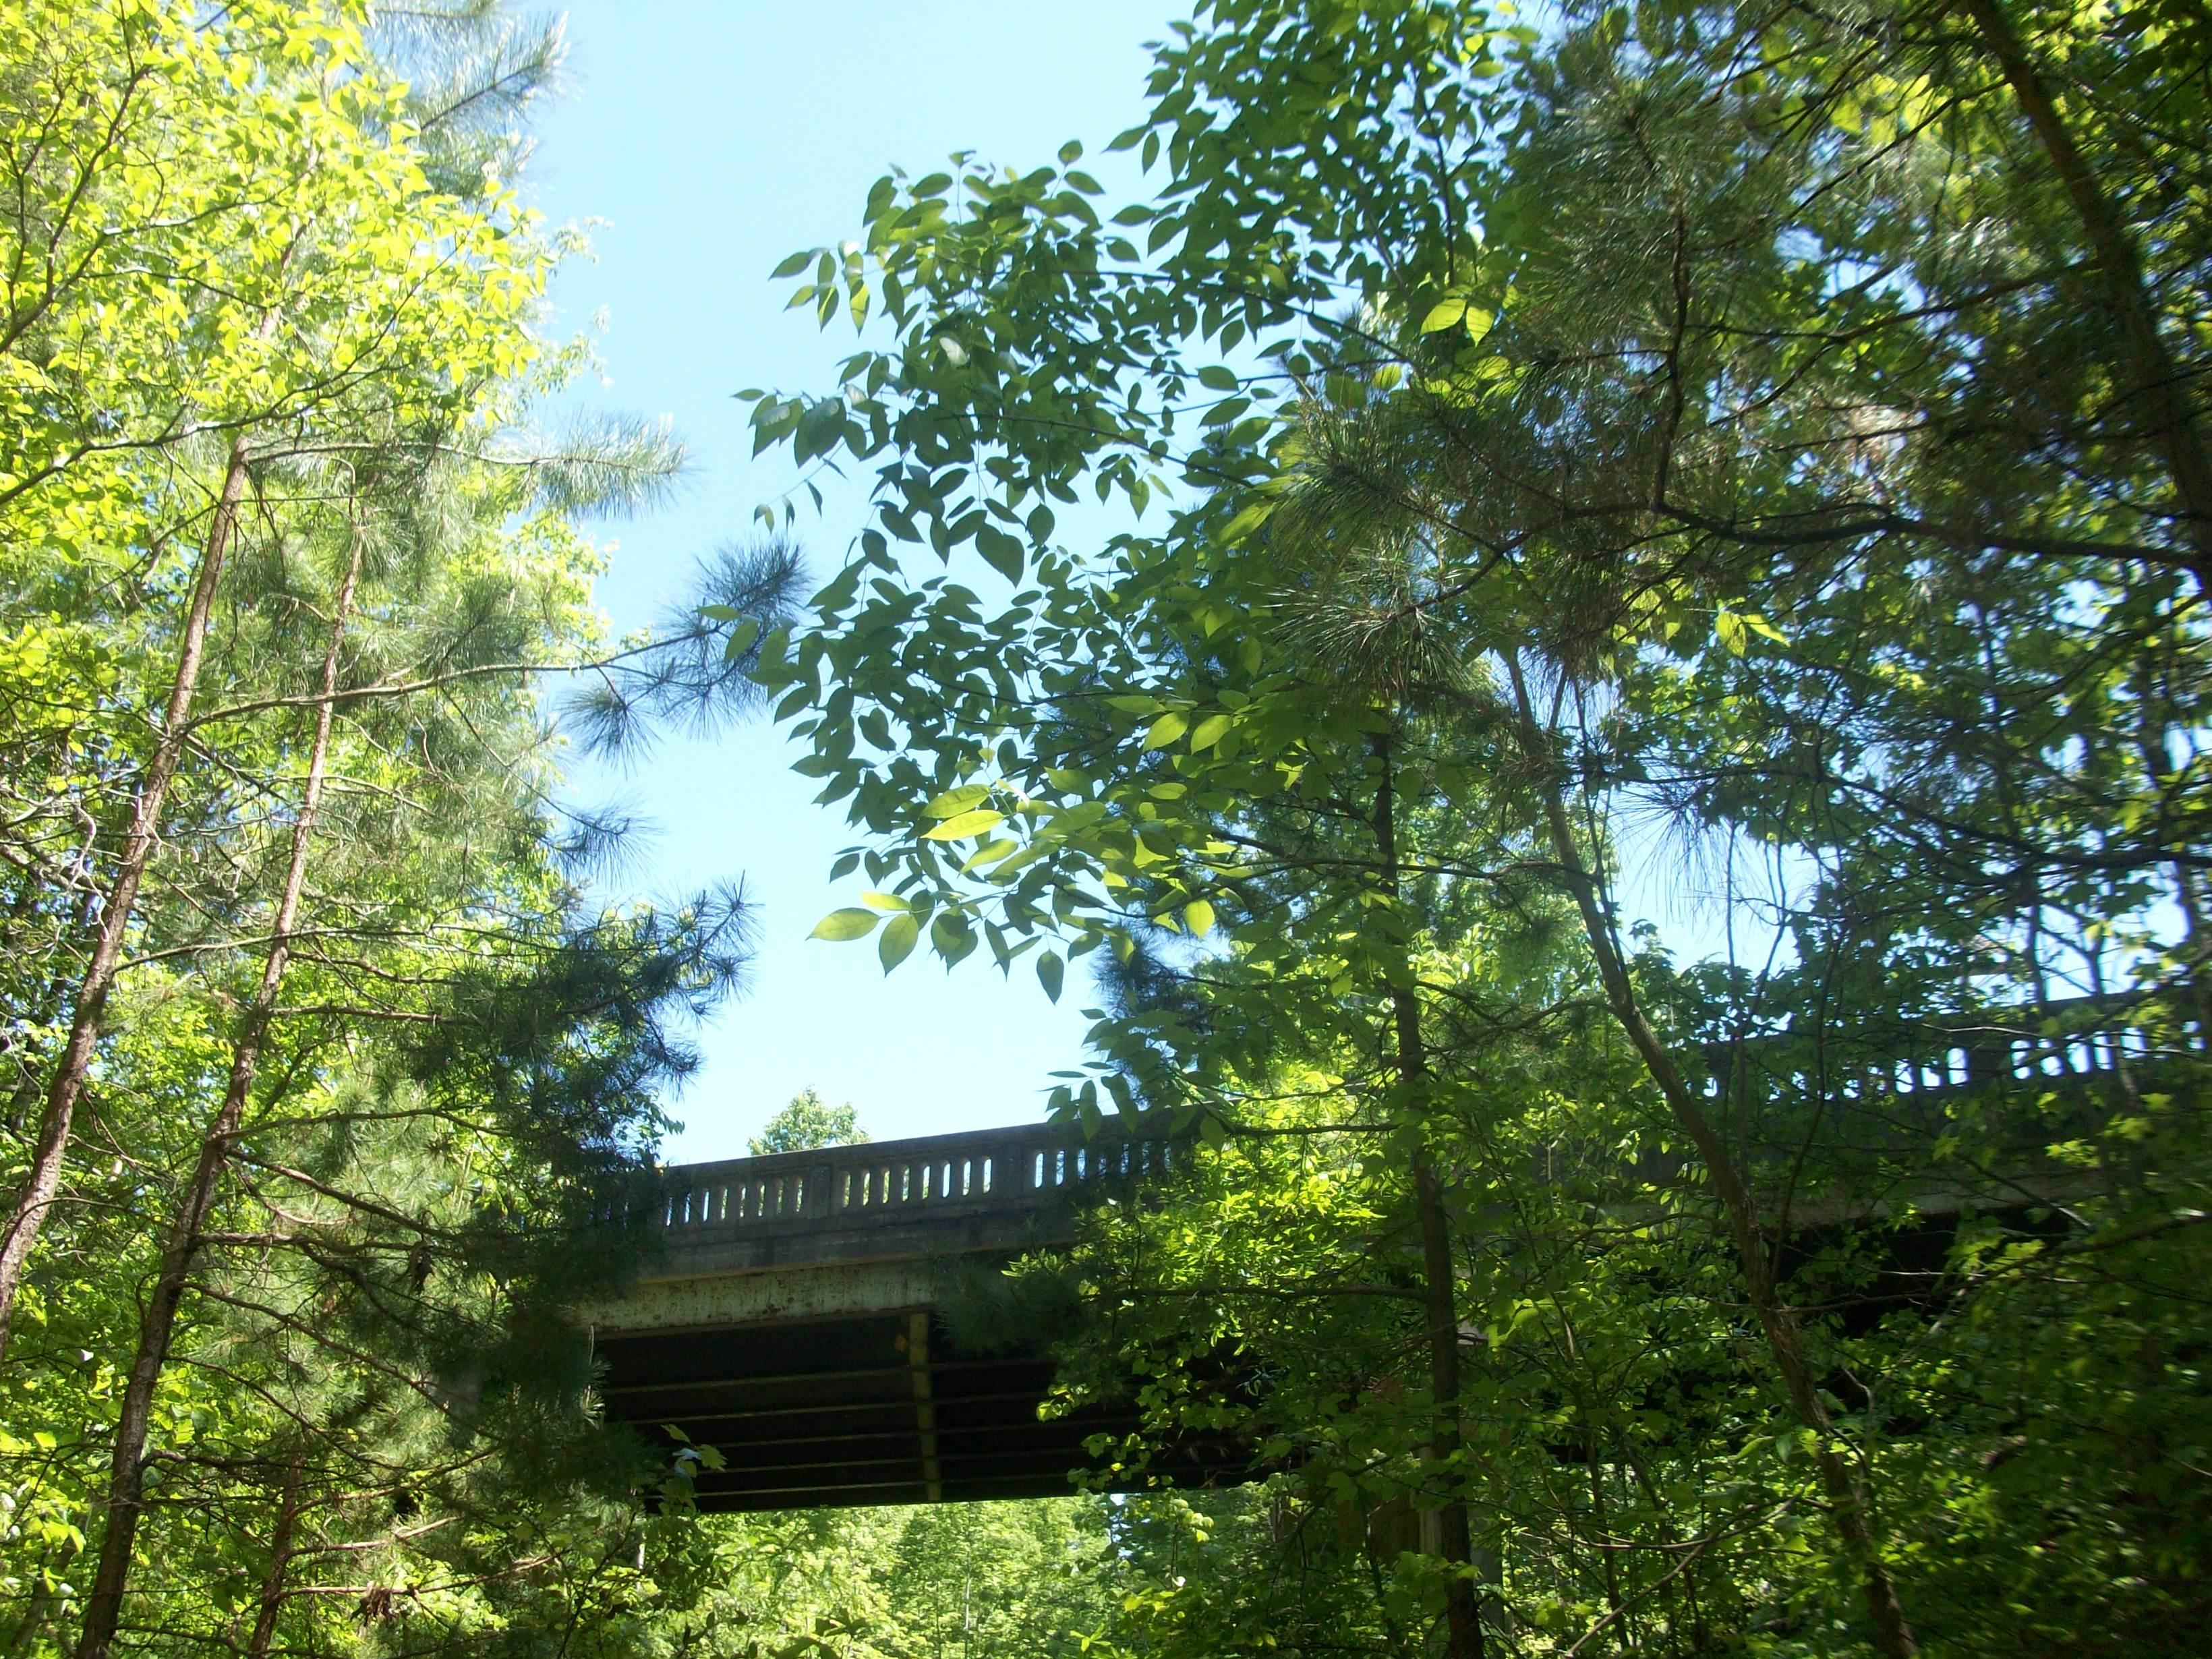 c317b2dbbd8 List of rail trails in South Carolina - Wikipedia